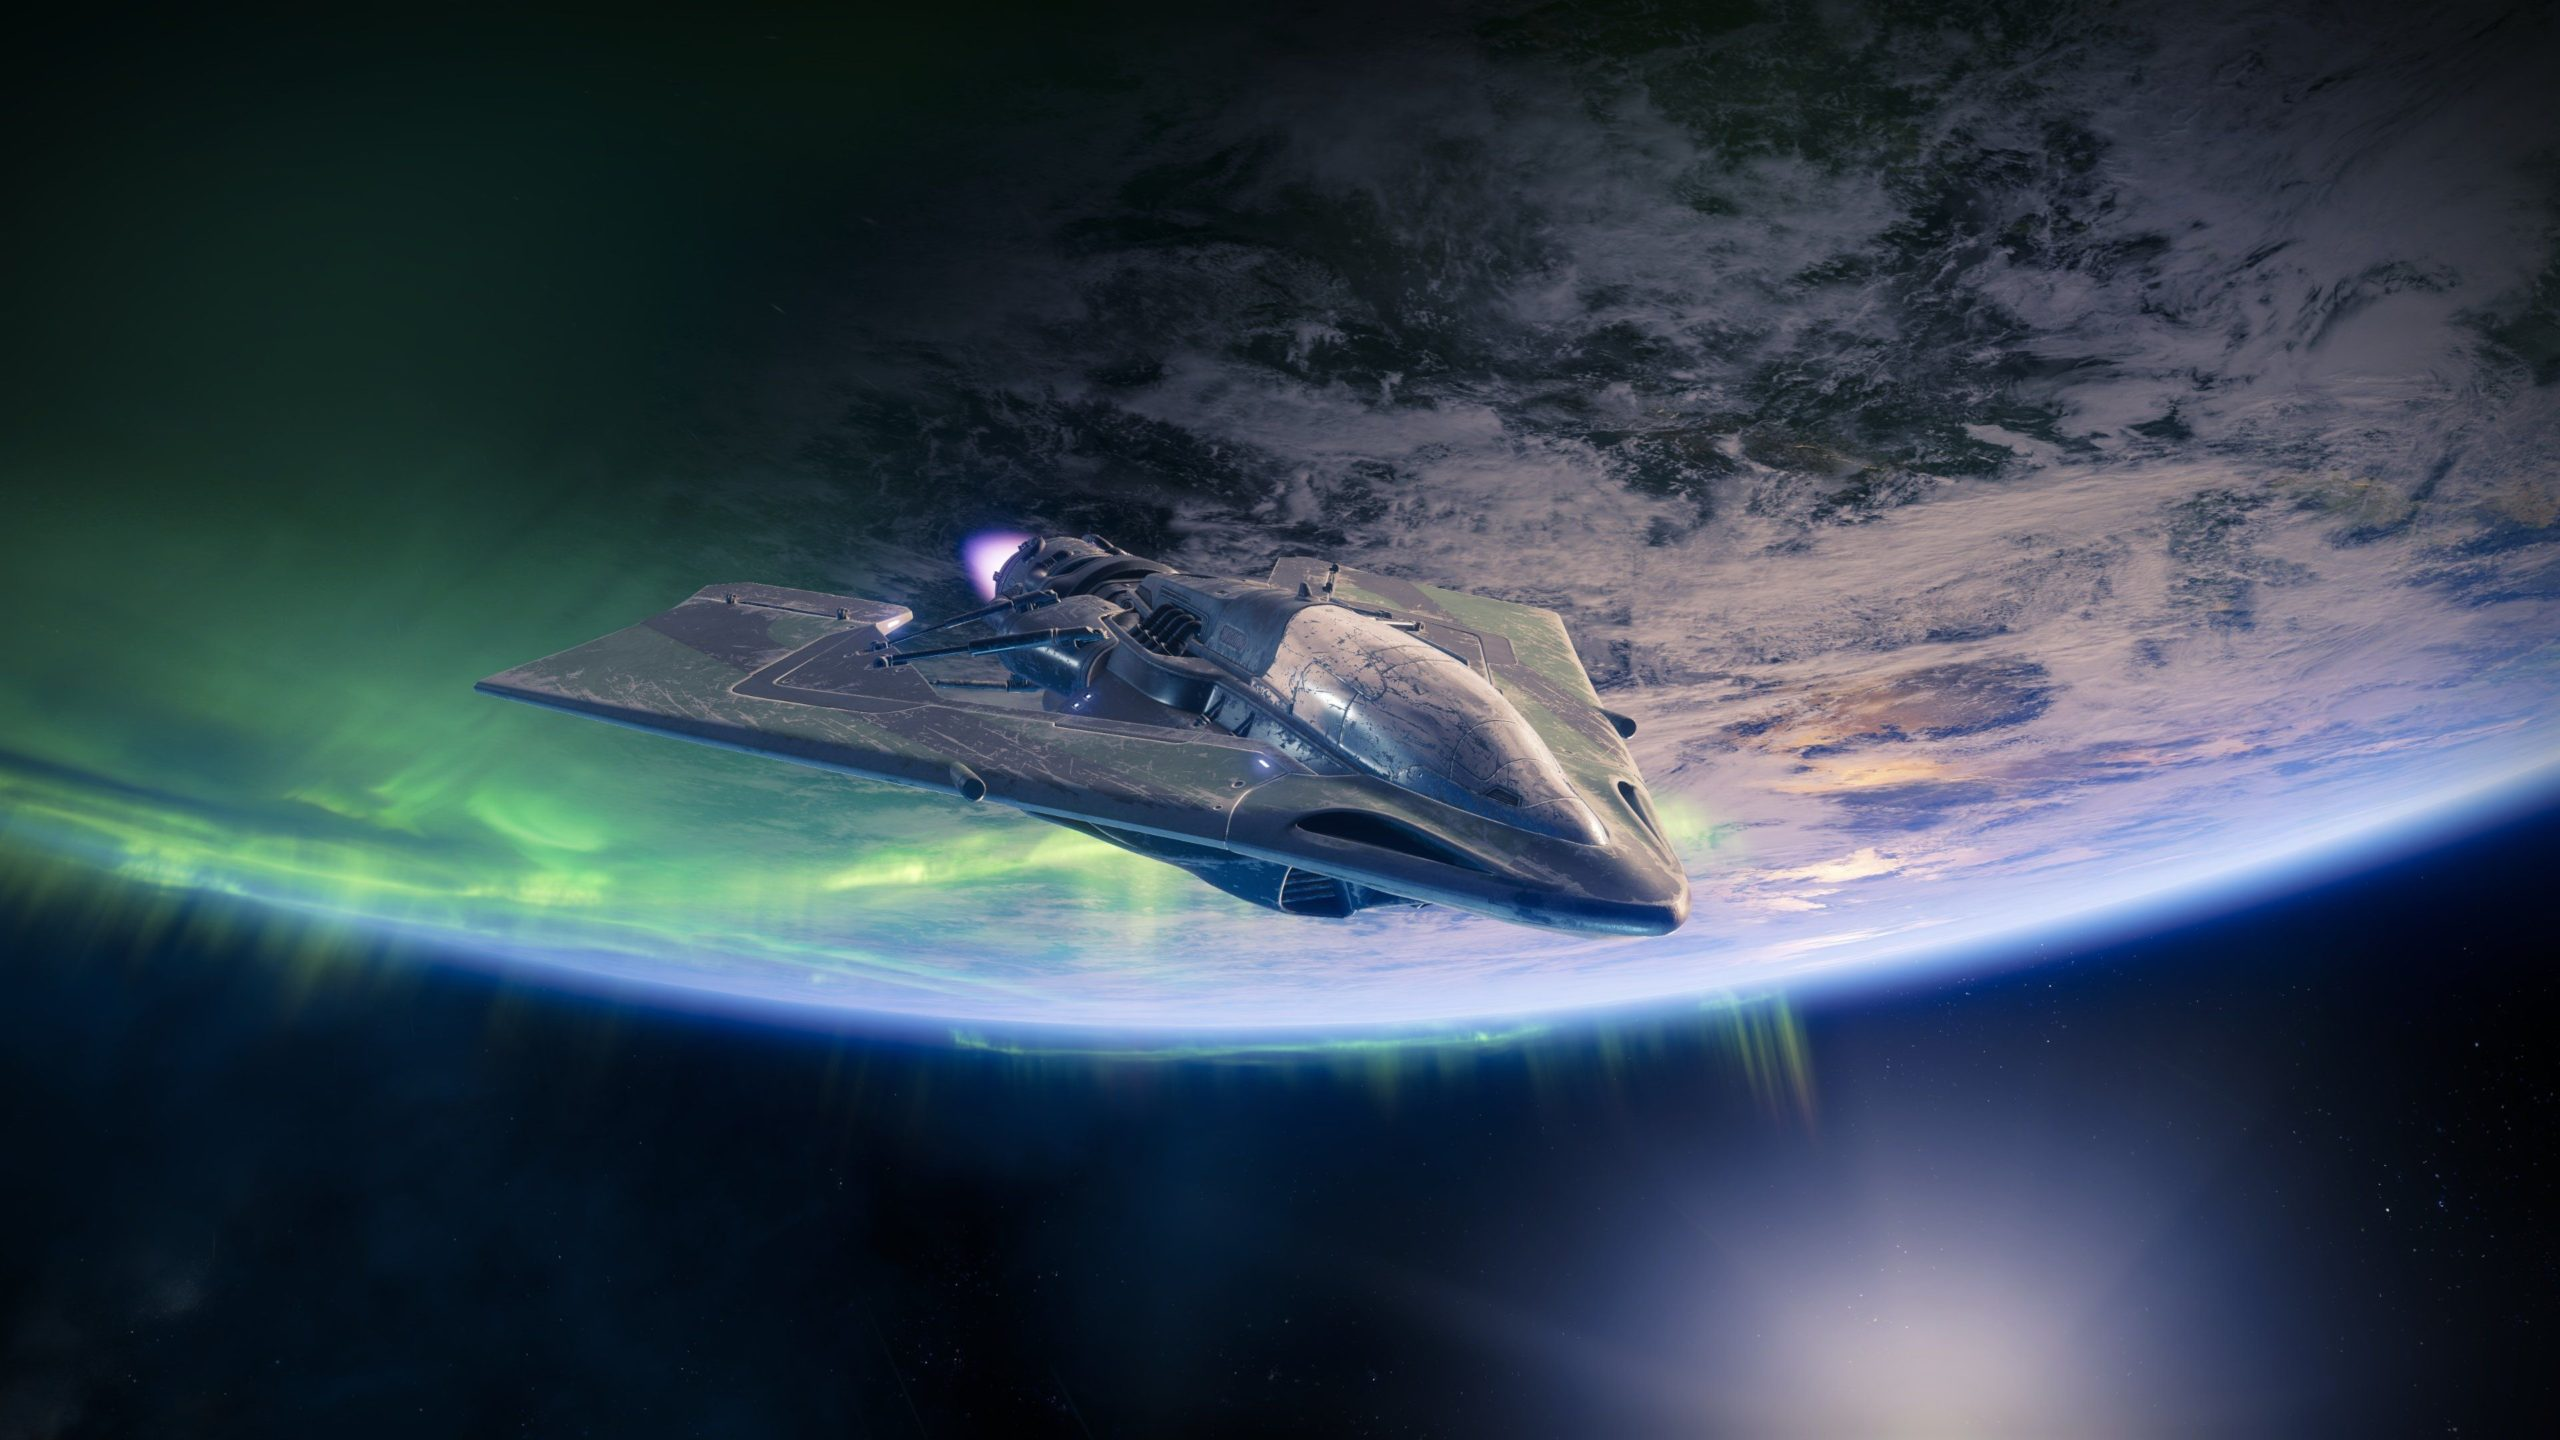 spaceship photography